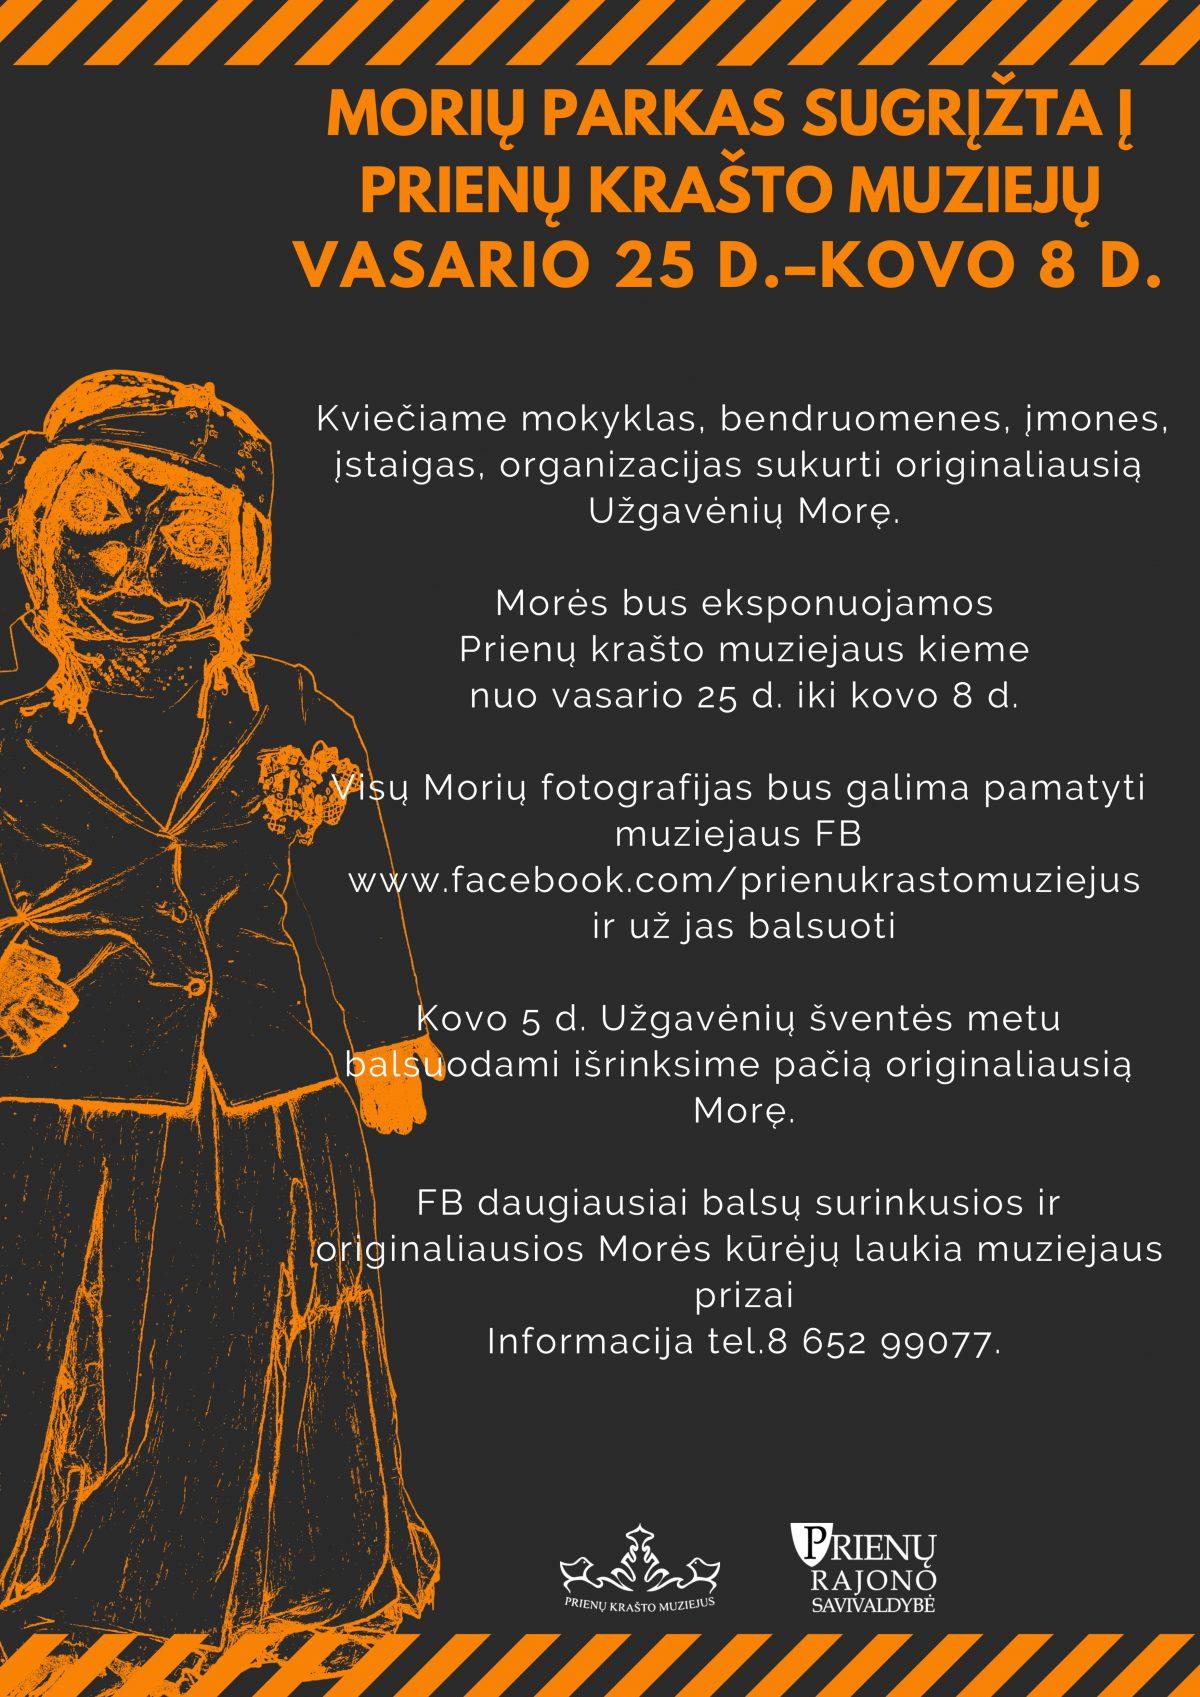 web_MoriuParkas2019_v4